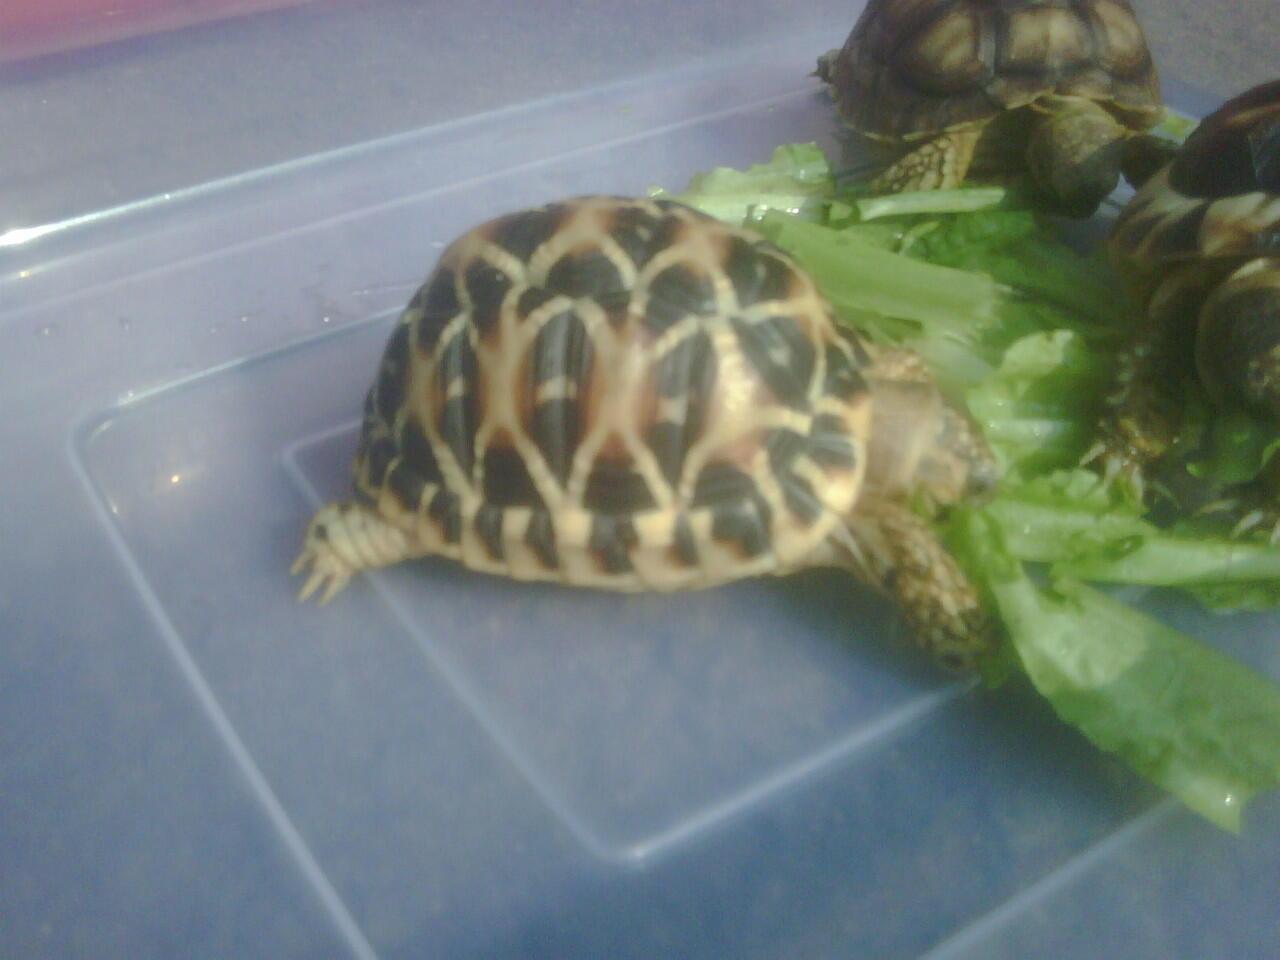 Wts Kura Darat / Tortoies Indian Star 2 ekor